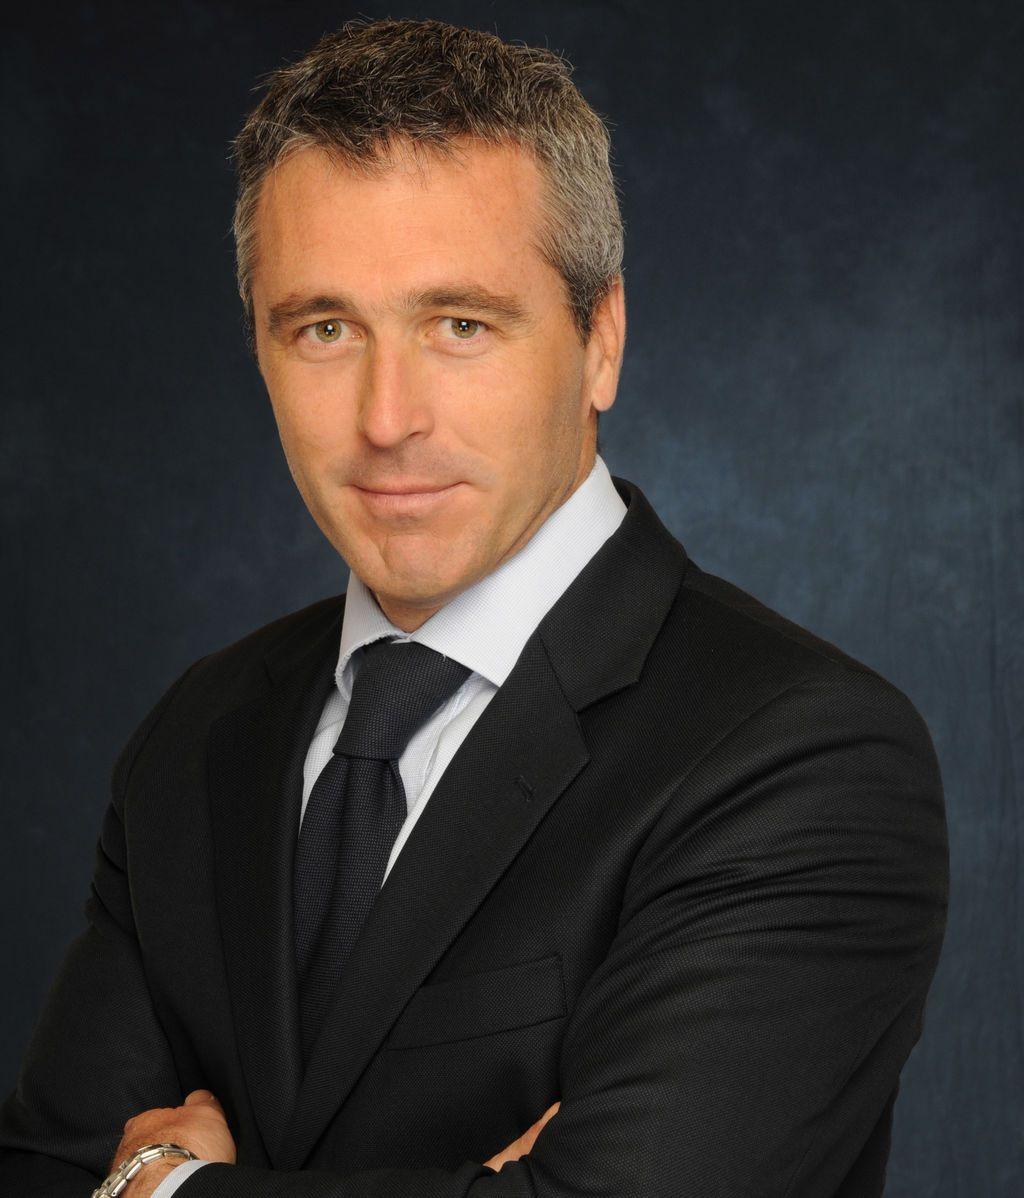 Ghislain Barrois